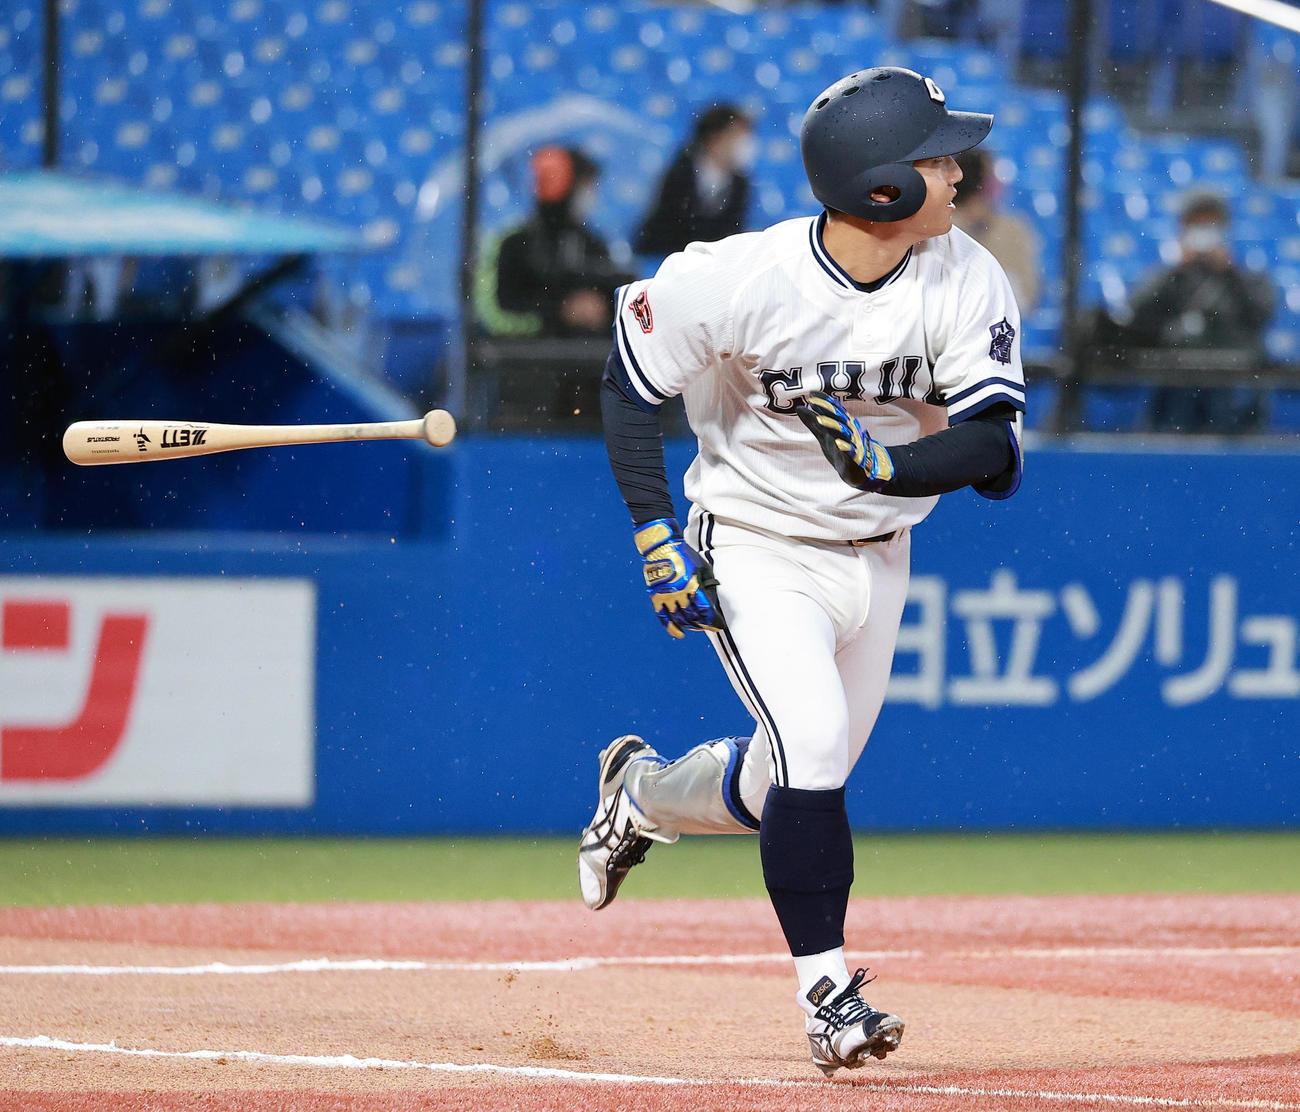 青学大対中大 7回裏中大2死一、三塁、古賀は左中間3点本塁打を放つ(撮影・浅見桂子)